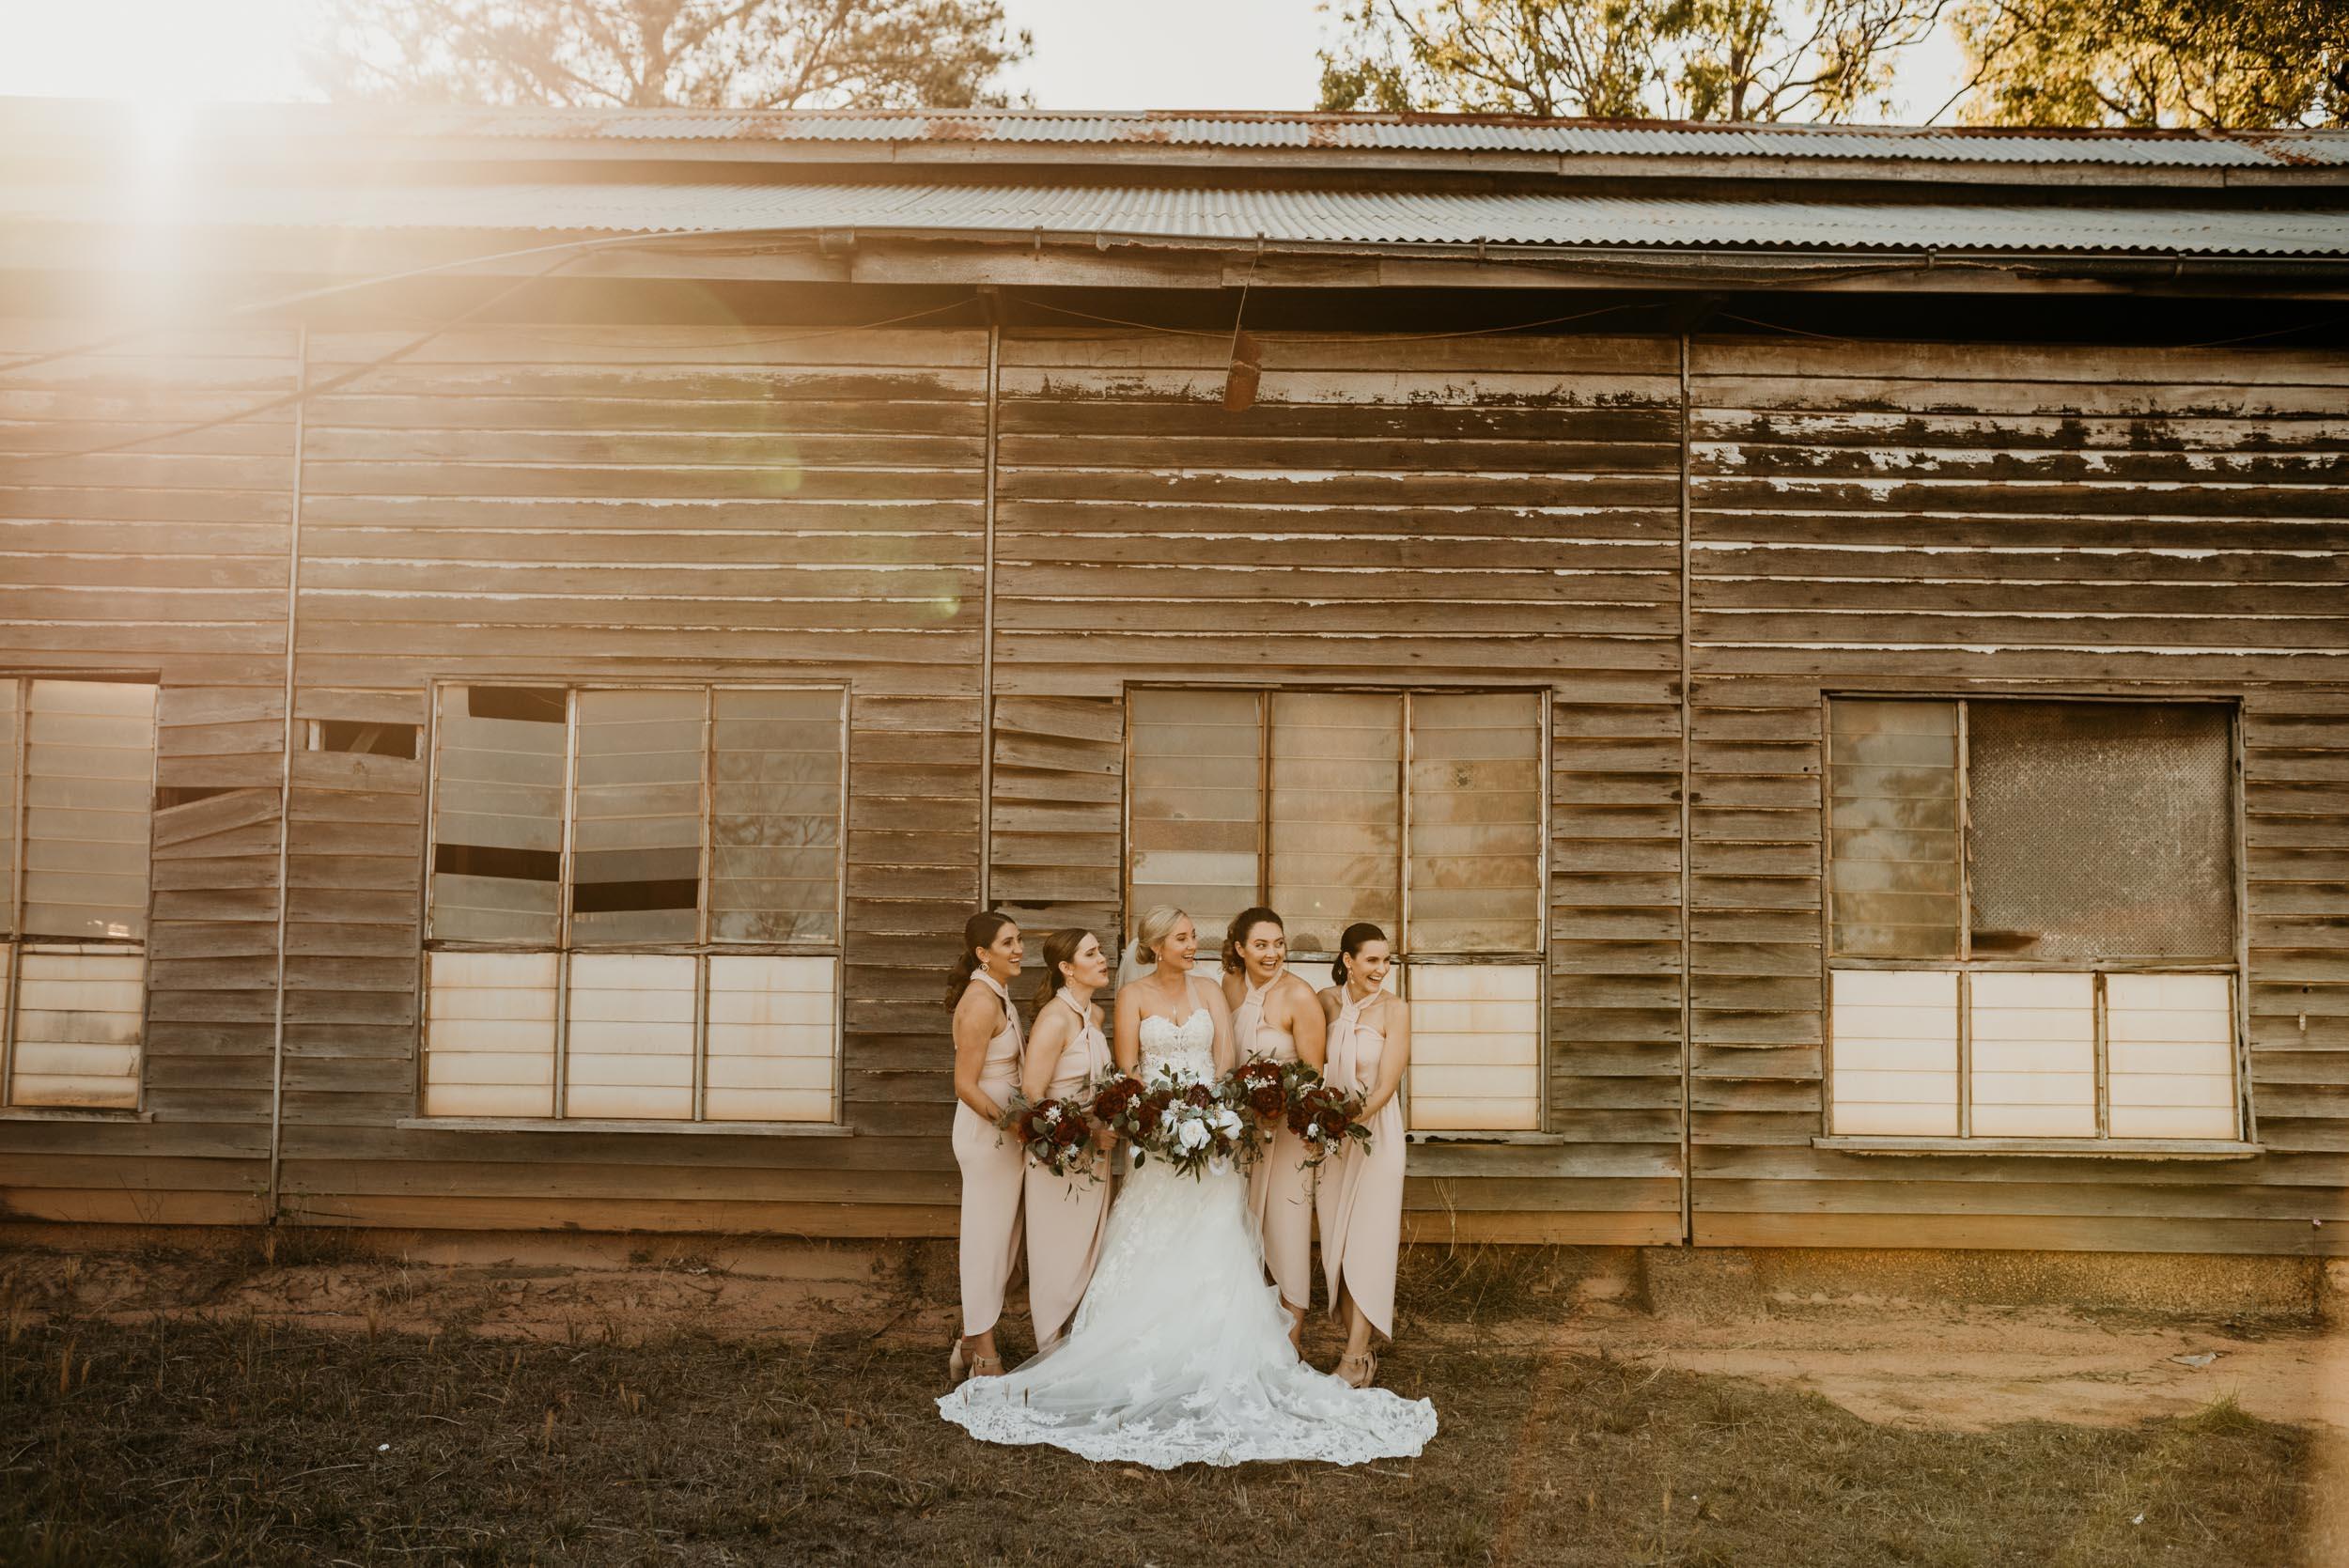 The Raw Photographer - Cairns and Port Douglas Wedding Photographer - Best of 2018-53.jpg